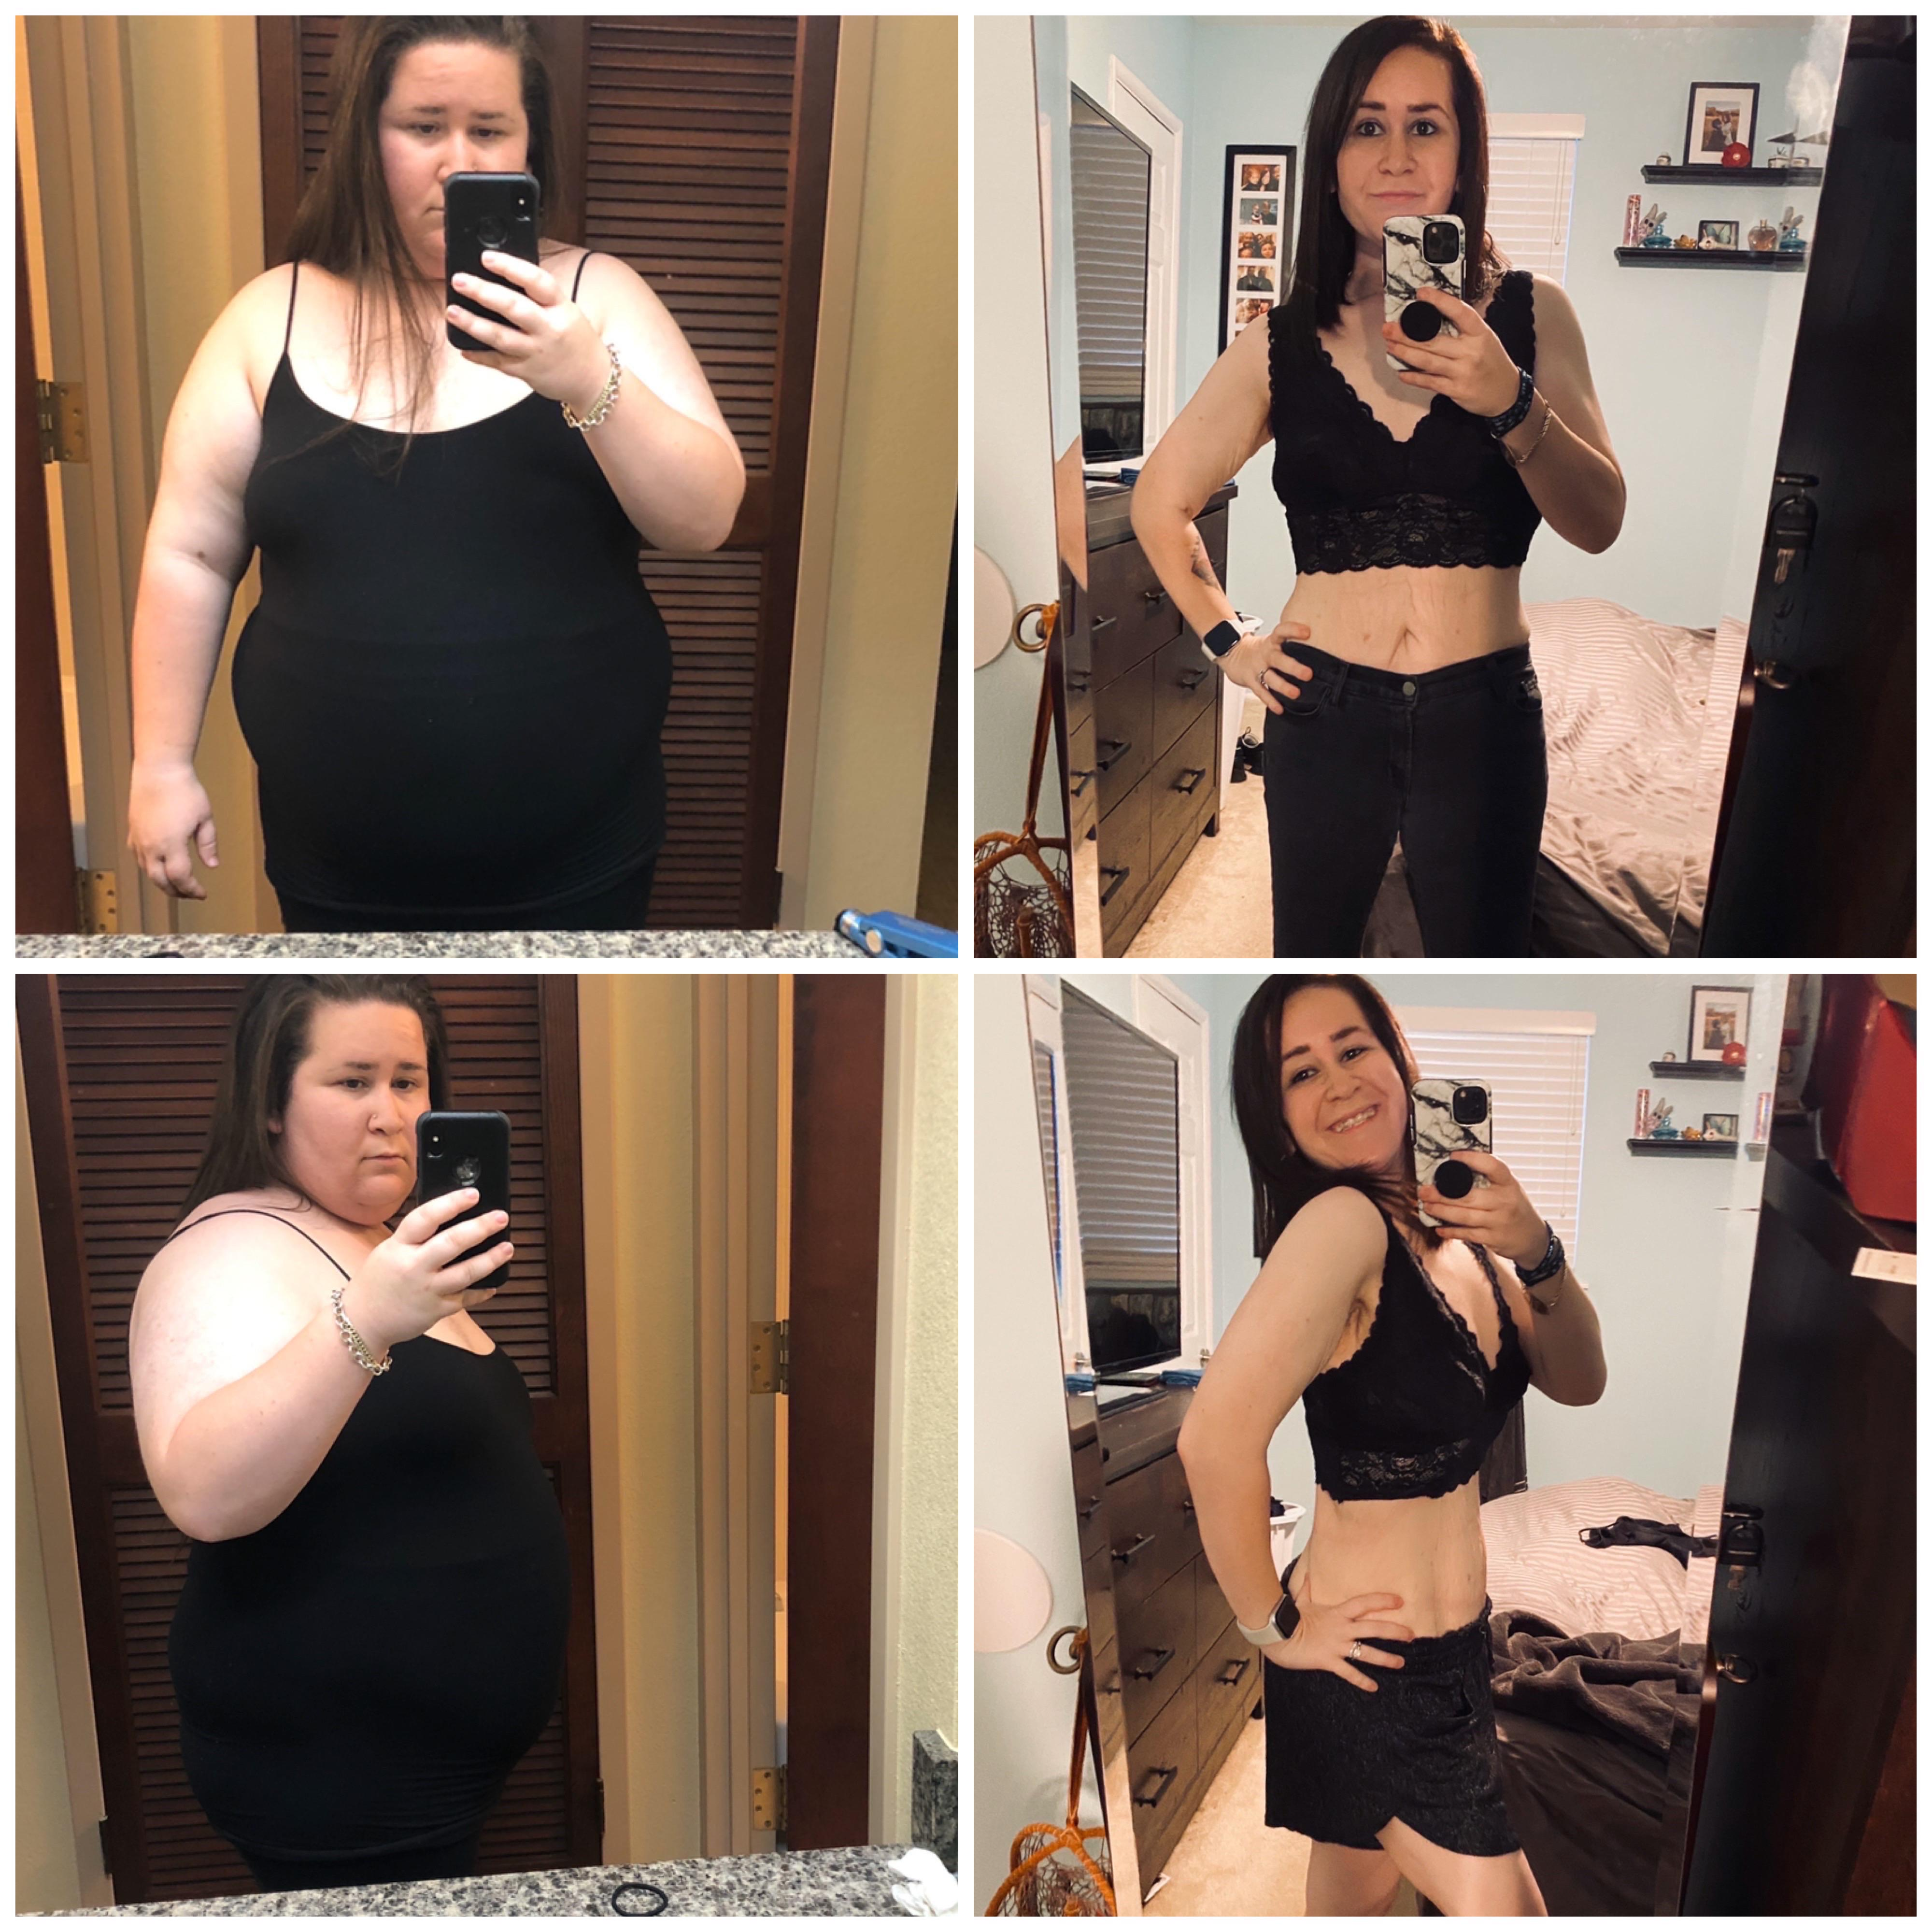 5 feet 2 Female 128 lbs Fat Loss 256 lbs to 128 lbs